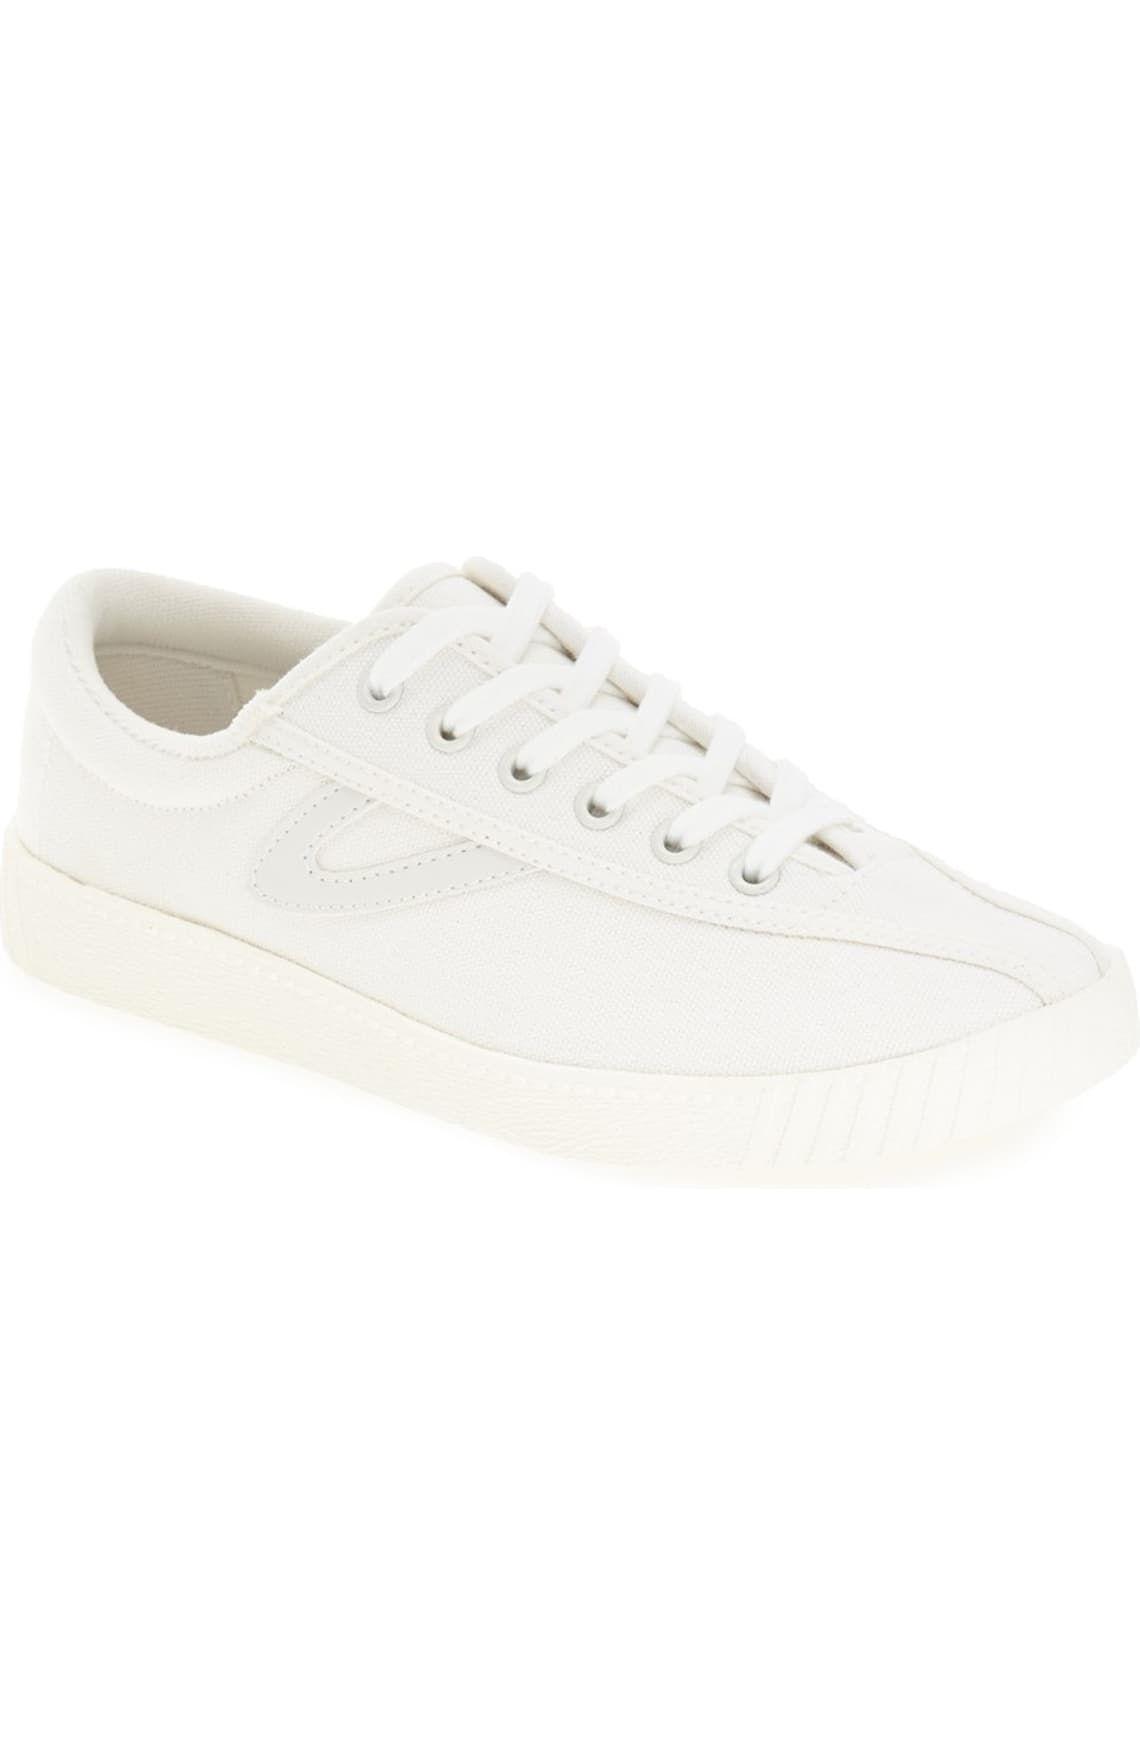 Tretorn Nylite Plus Sneaker (Women